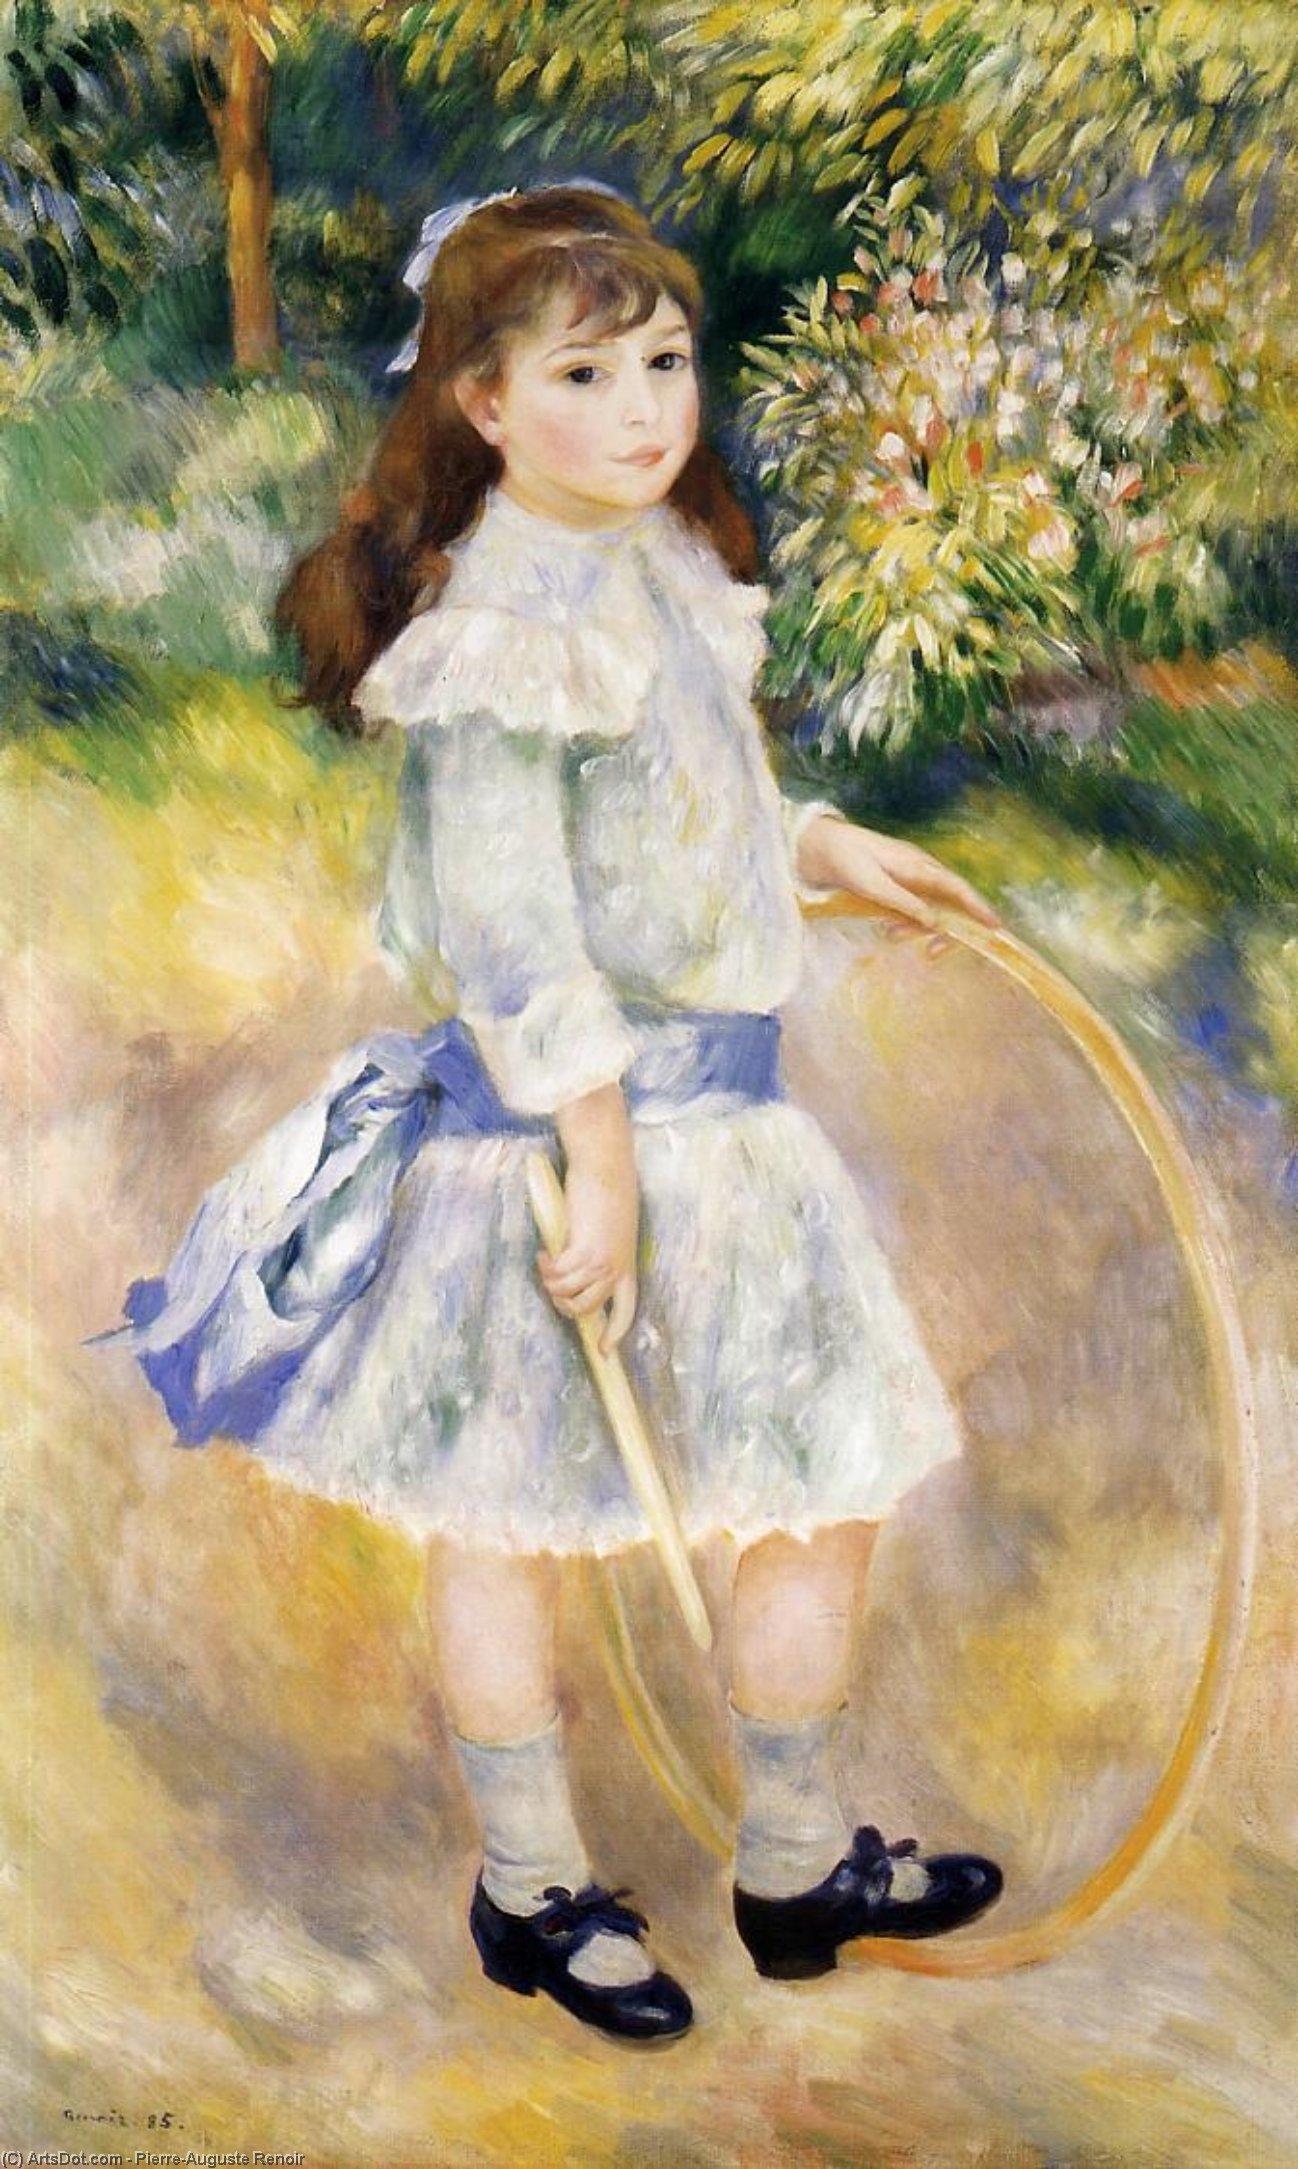 Wikoo.org - موسوعة الفنون الجميلة - اللوحة، العمل الفني Pierre-Auguste Renoir - Girl with a Hoop